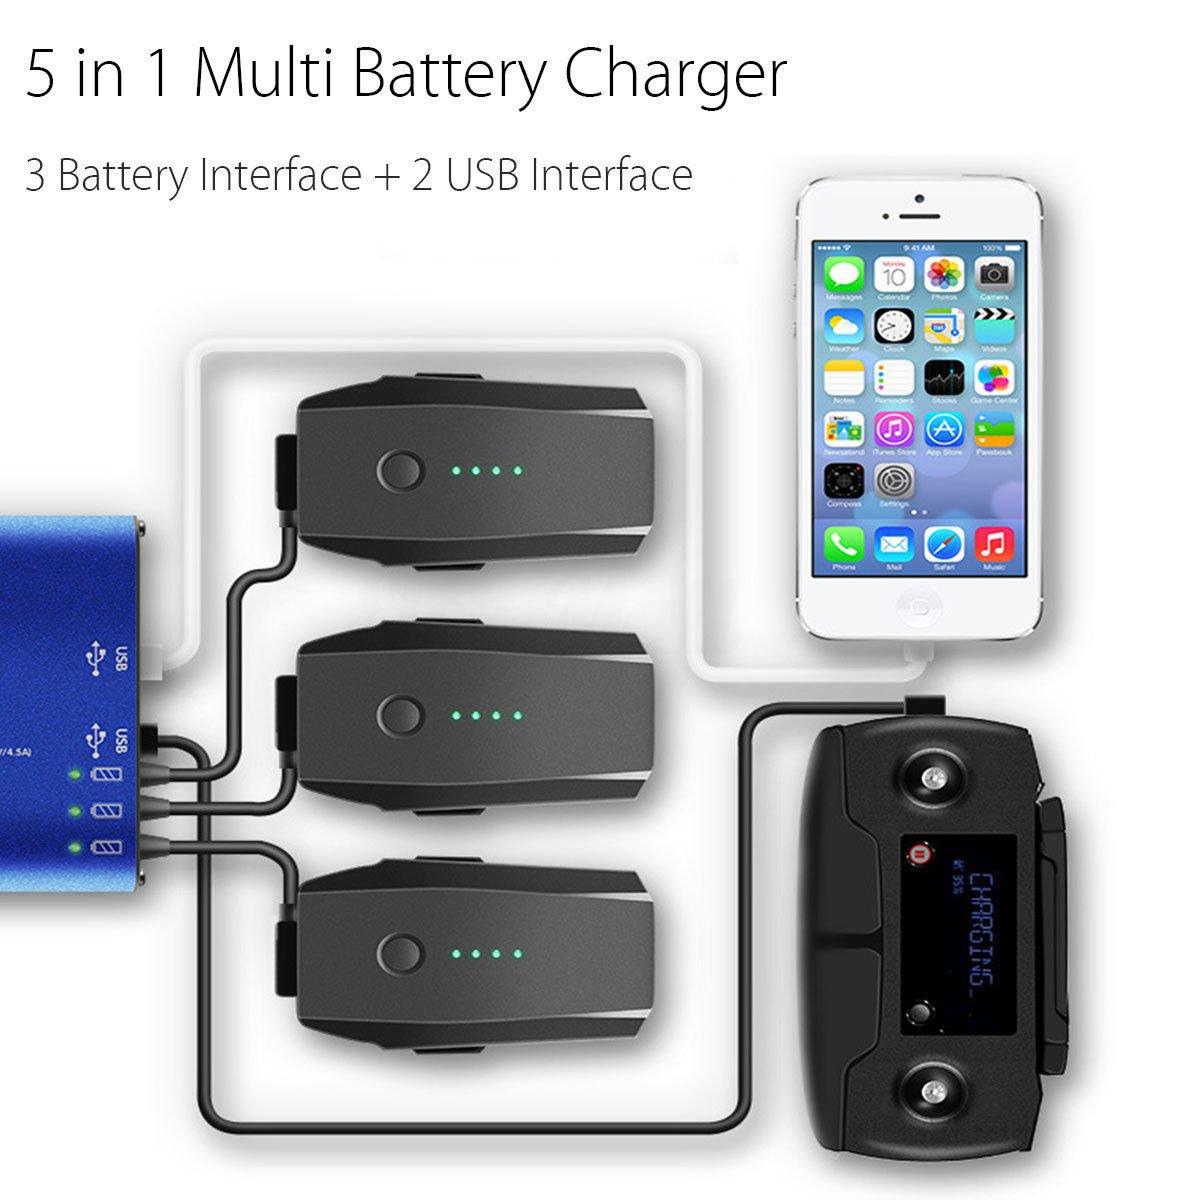 Signstek FSLabs DJI Mavic Pro 5 in 1 Rapid Battery Charger Smart Multi Battery Intelligent Charging Hub by Signstek (Image #1)